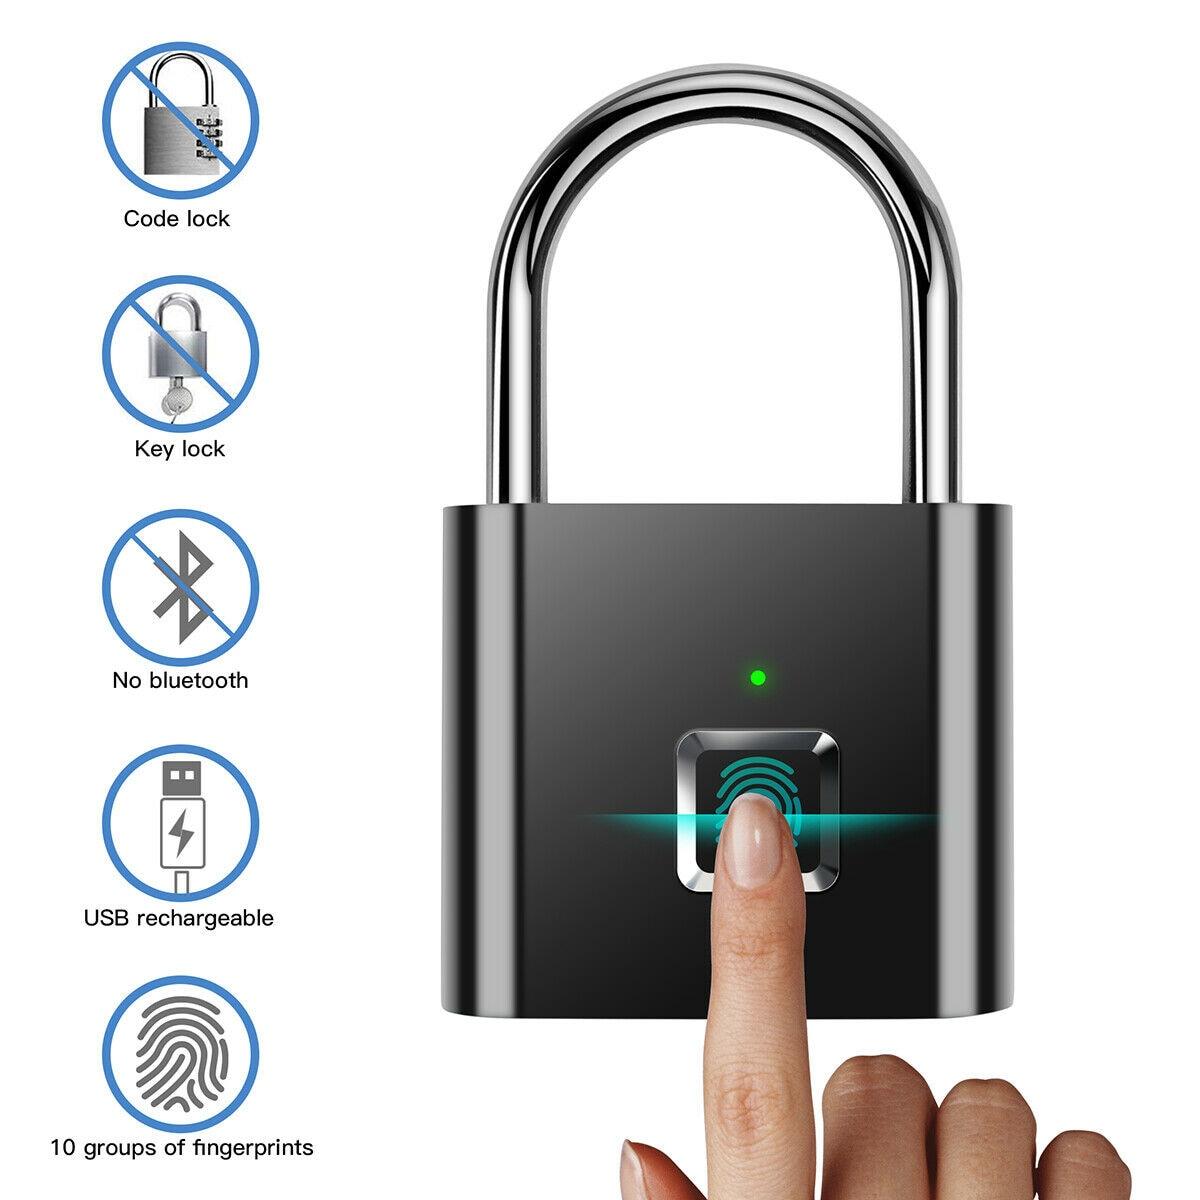 Anti-Theft Keyless USB Rechargeable Door Lock Fingerprint Smart Padlock Quick Unlock Zinc Alloy Metal Self Developing Chip